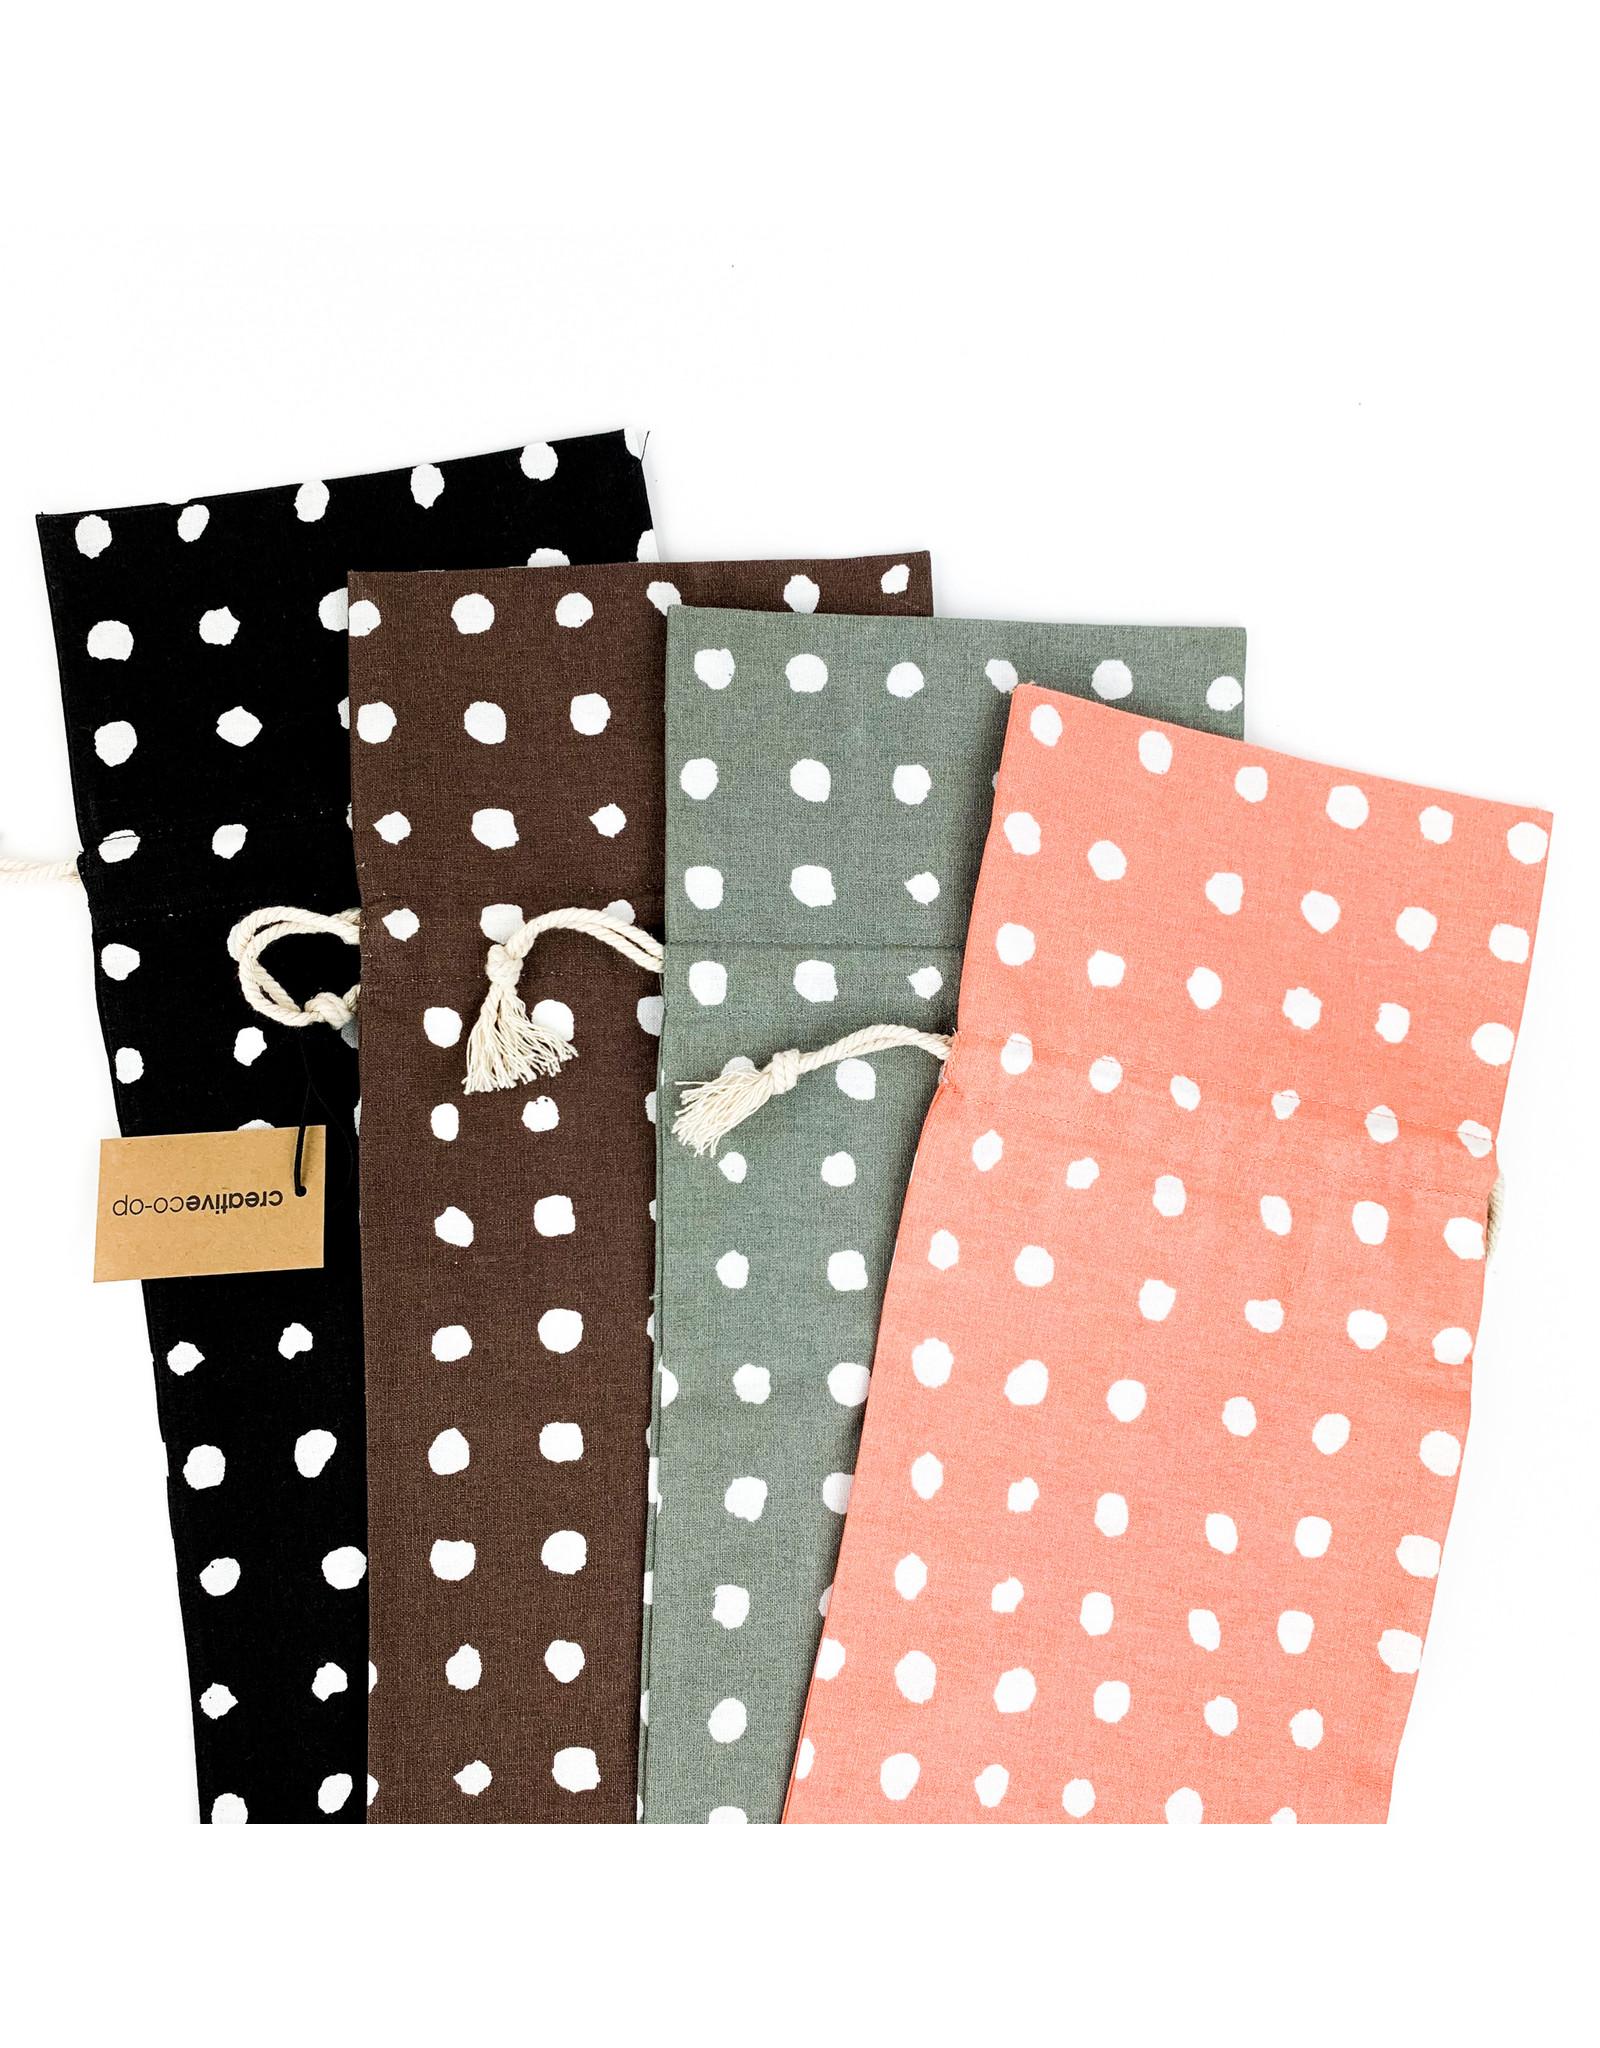 Design Imports Rustic flower sack s/4